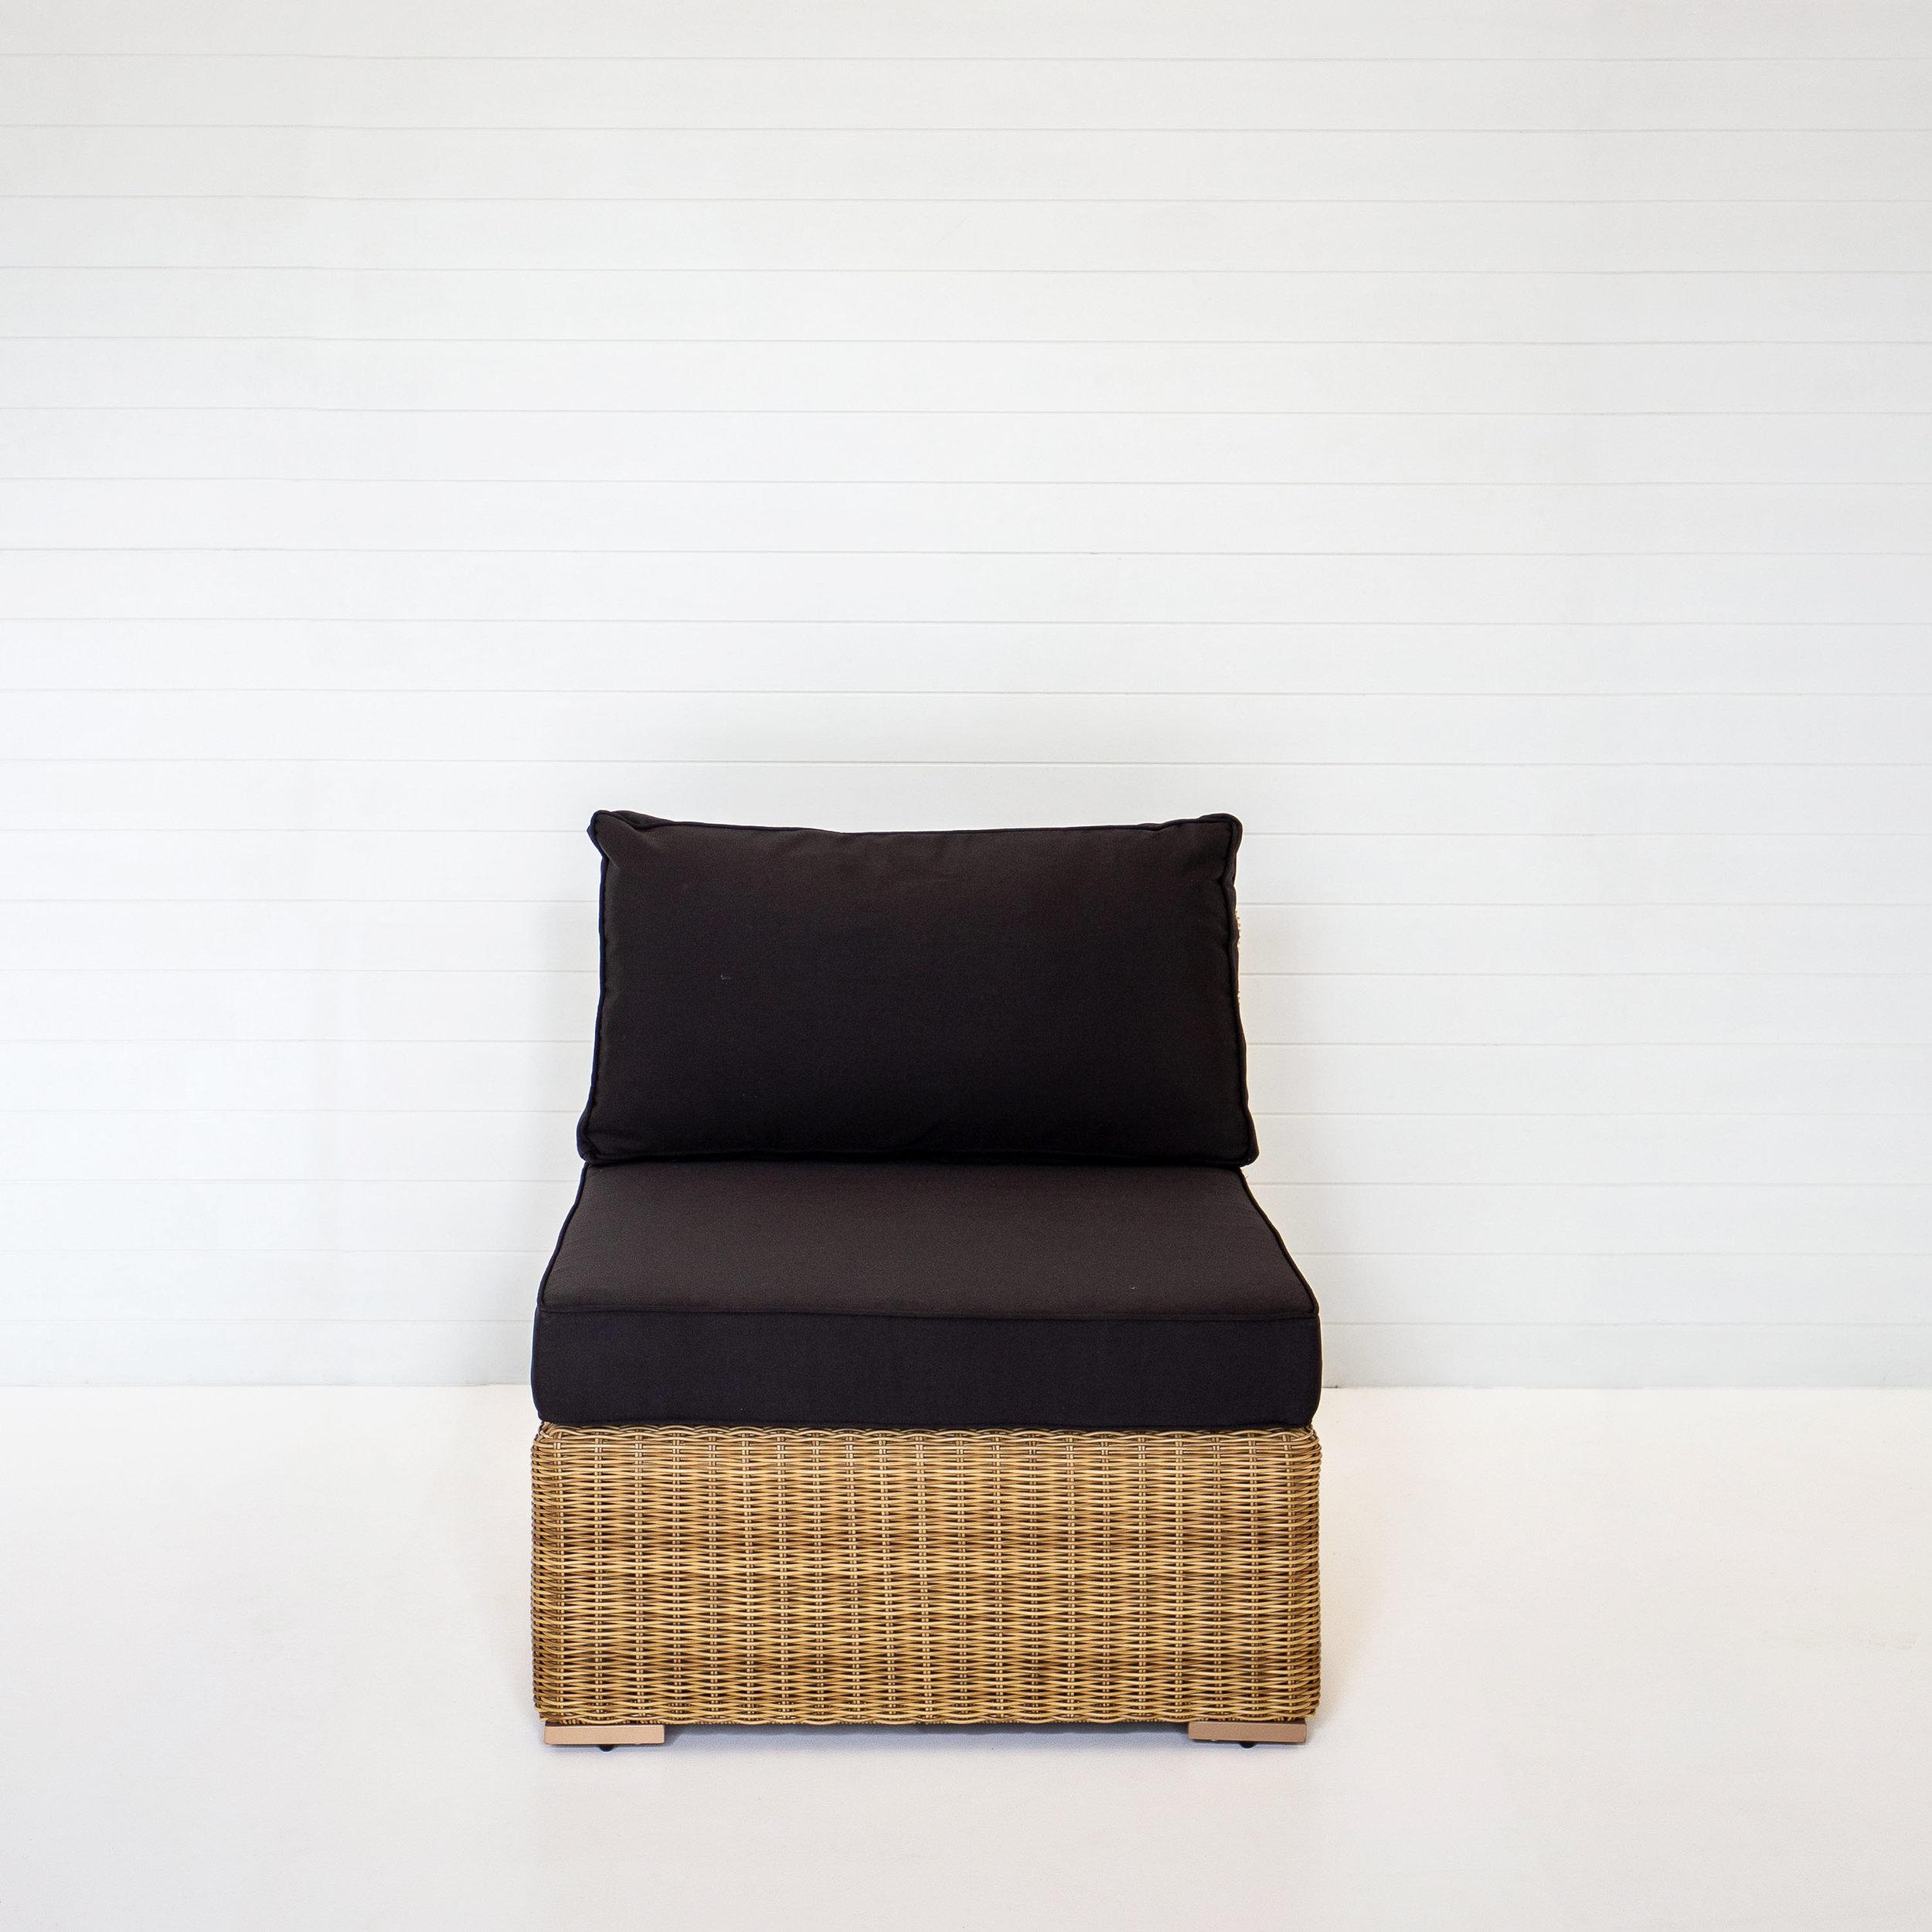 DUNE SINGLE SEAT MODULAR LOUNGE WITH BLACK CUSHIONS